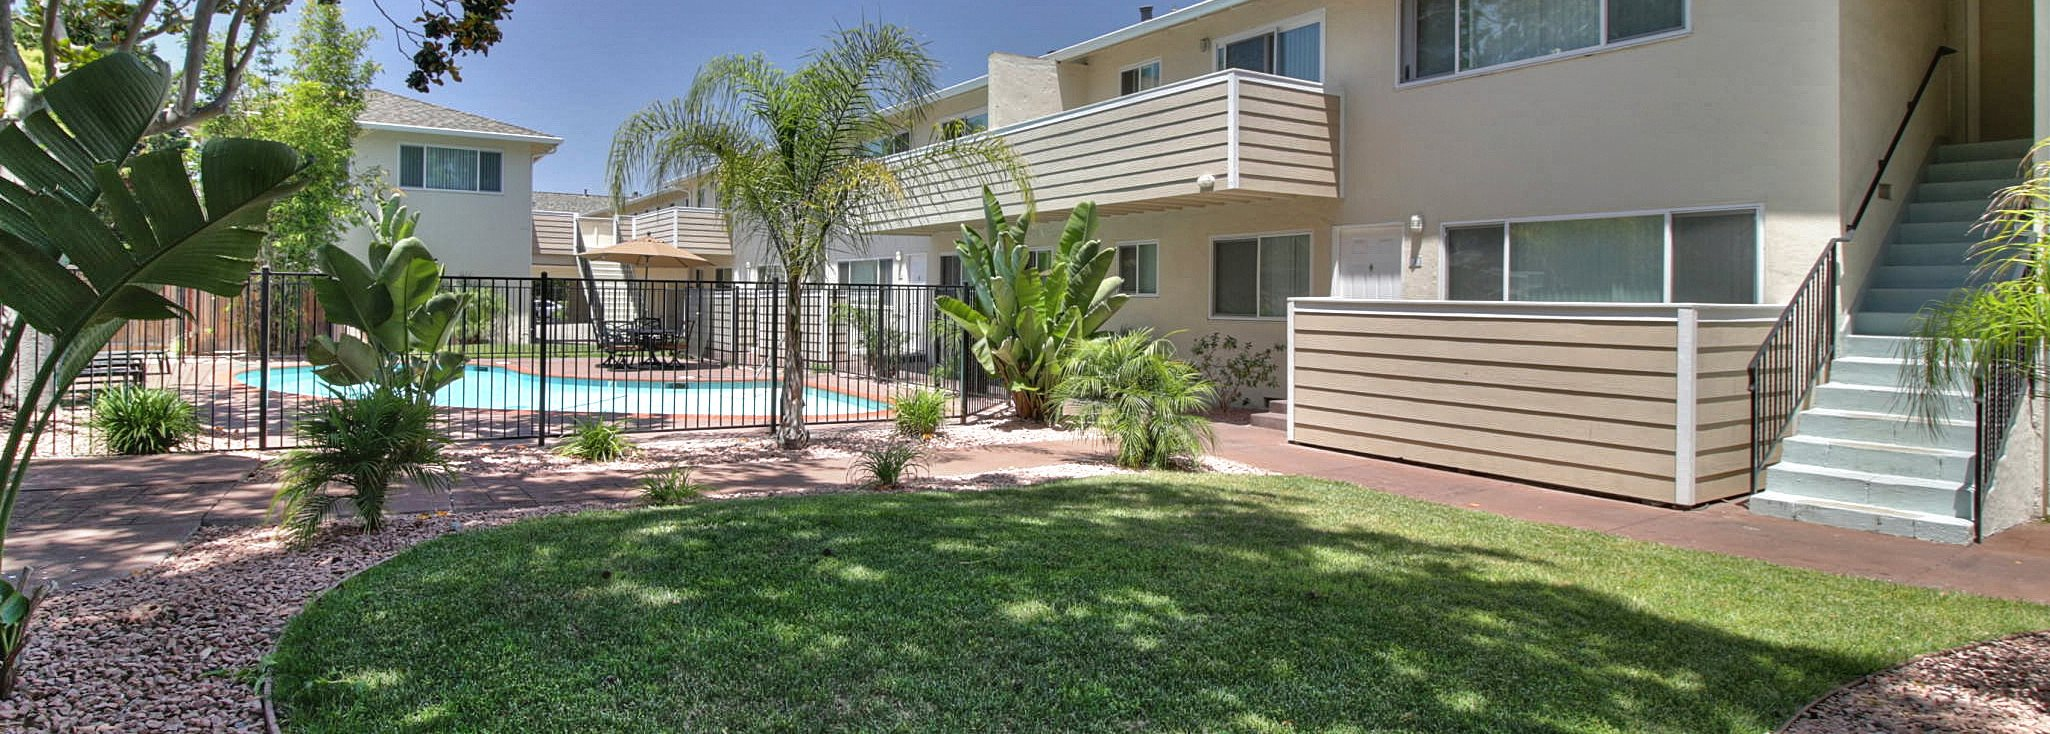 241 curtner apartments in palo alto ca - Palo alto ymca swimming pool schedule ...